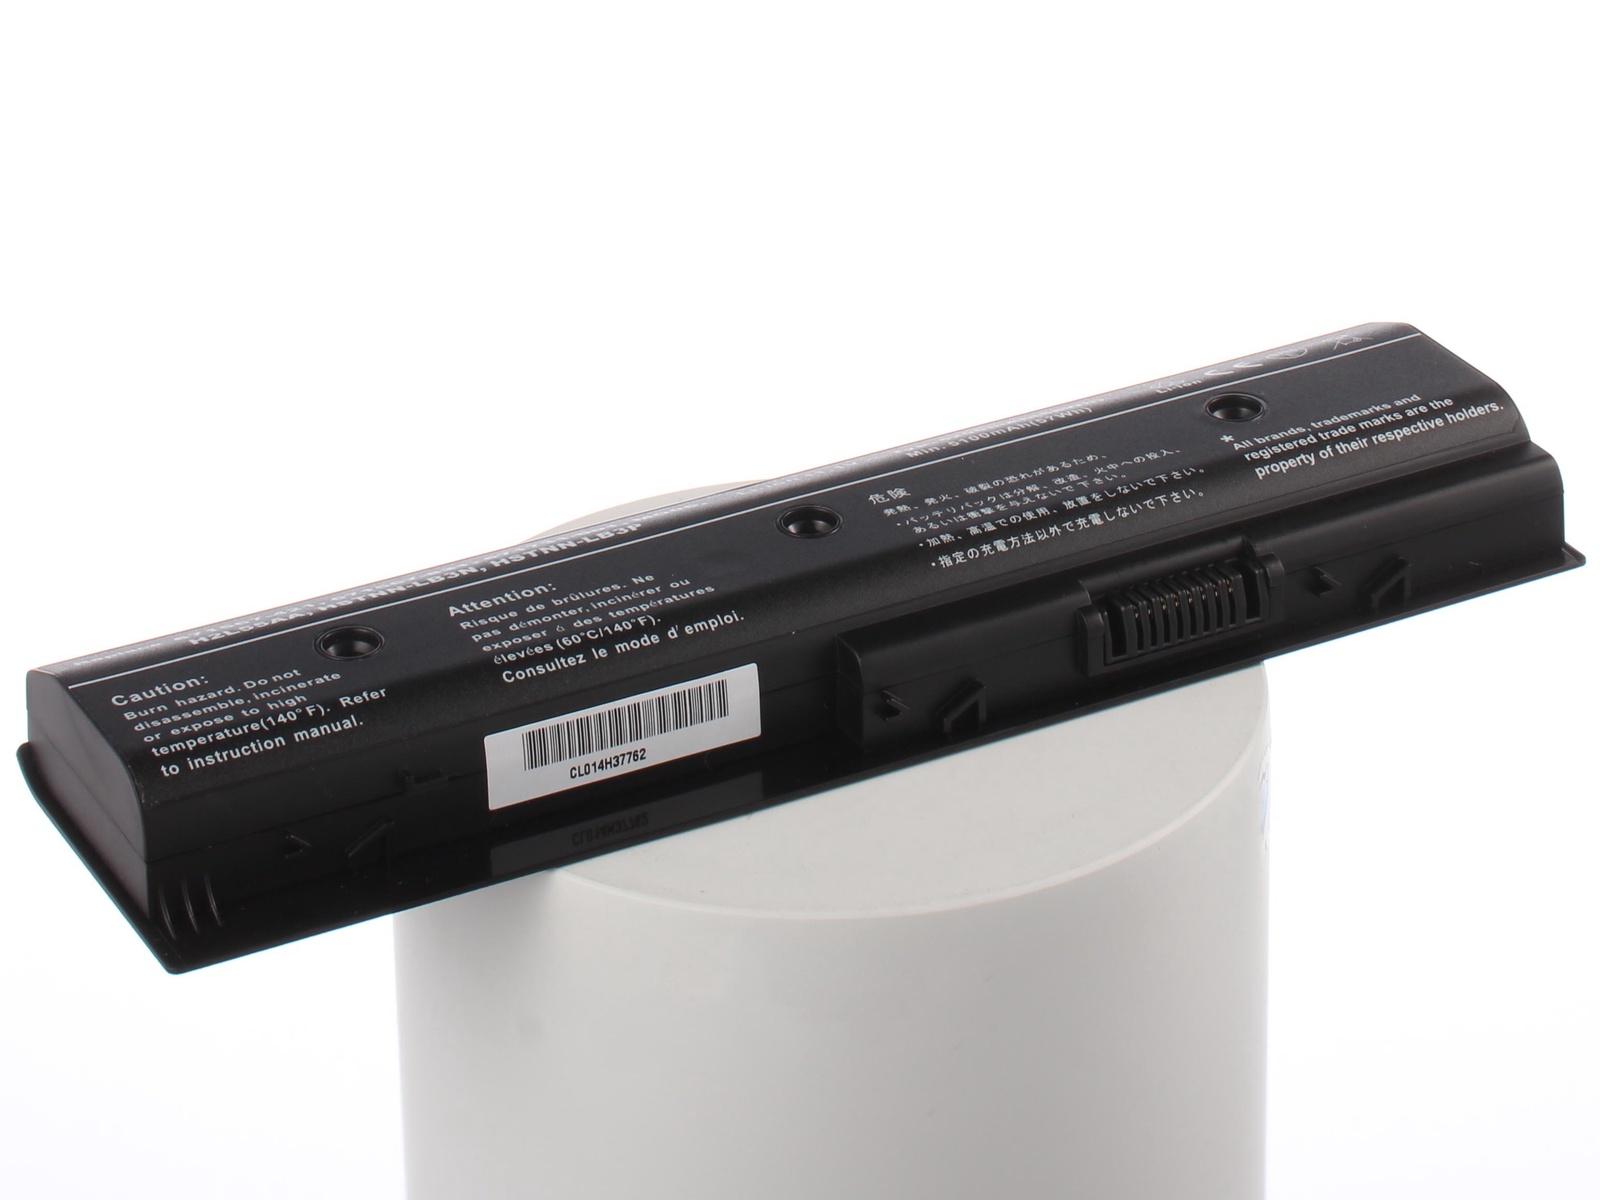 Аккумулятор для ноутбука iBatt для HP-Compaq ENVY dv7-7264er, Pavilion dv6-7051er, Pavilion m6-1040er, Envy 15-j011sr, Envy 15-j015sr, ENVY m6-1152er, Pavilion dv6-7058er, Pavilion dv7-7005er, ENVY dv7-7253er, ENVY m6-1106er цена